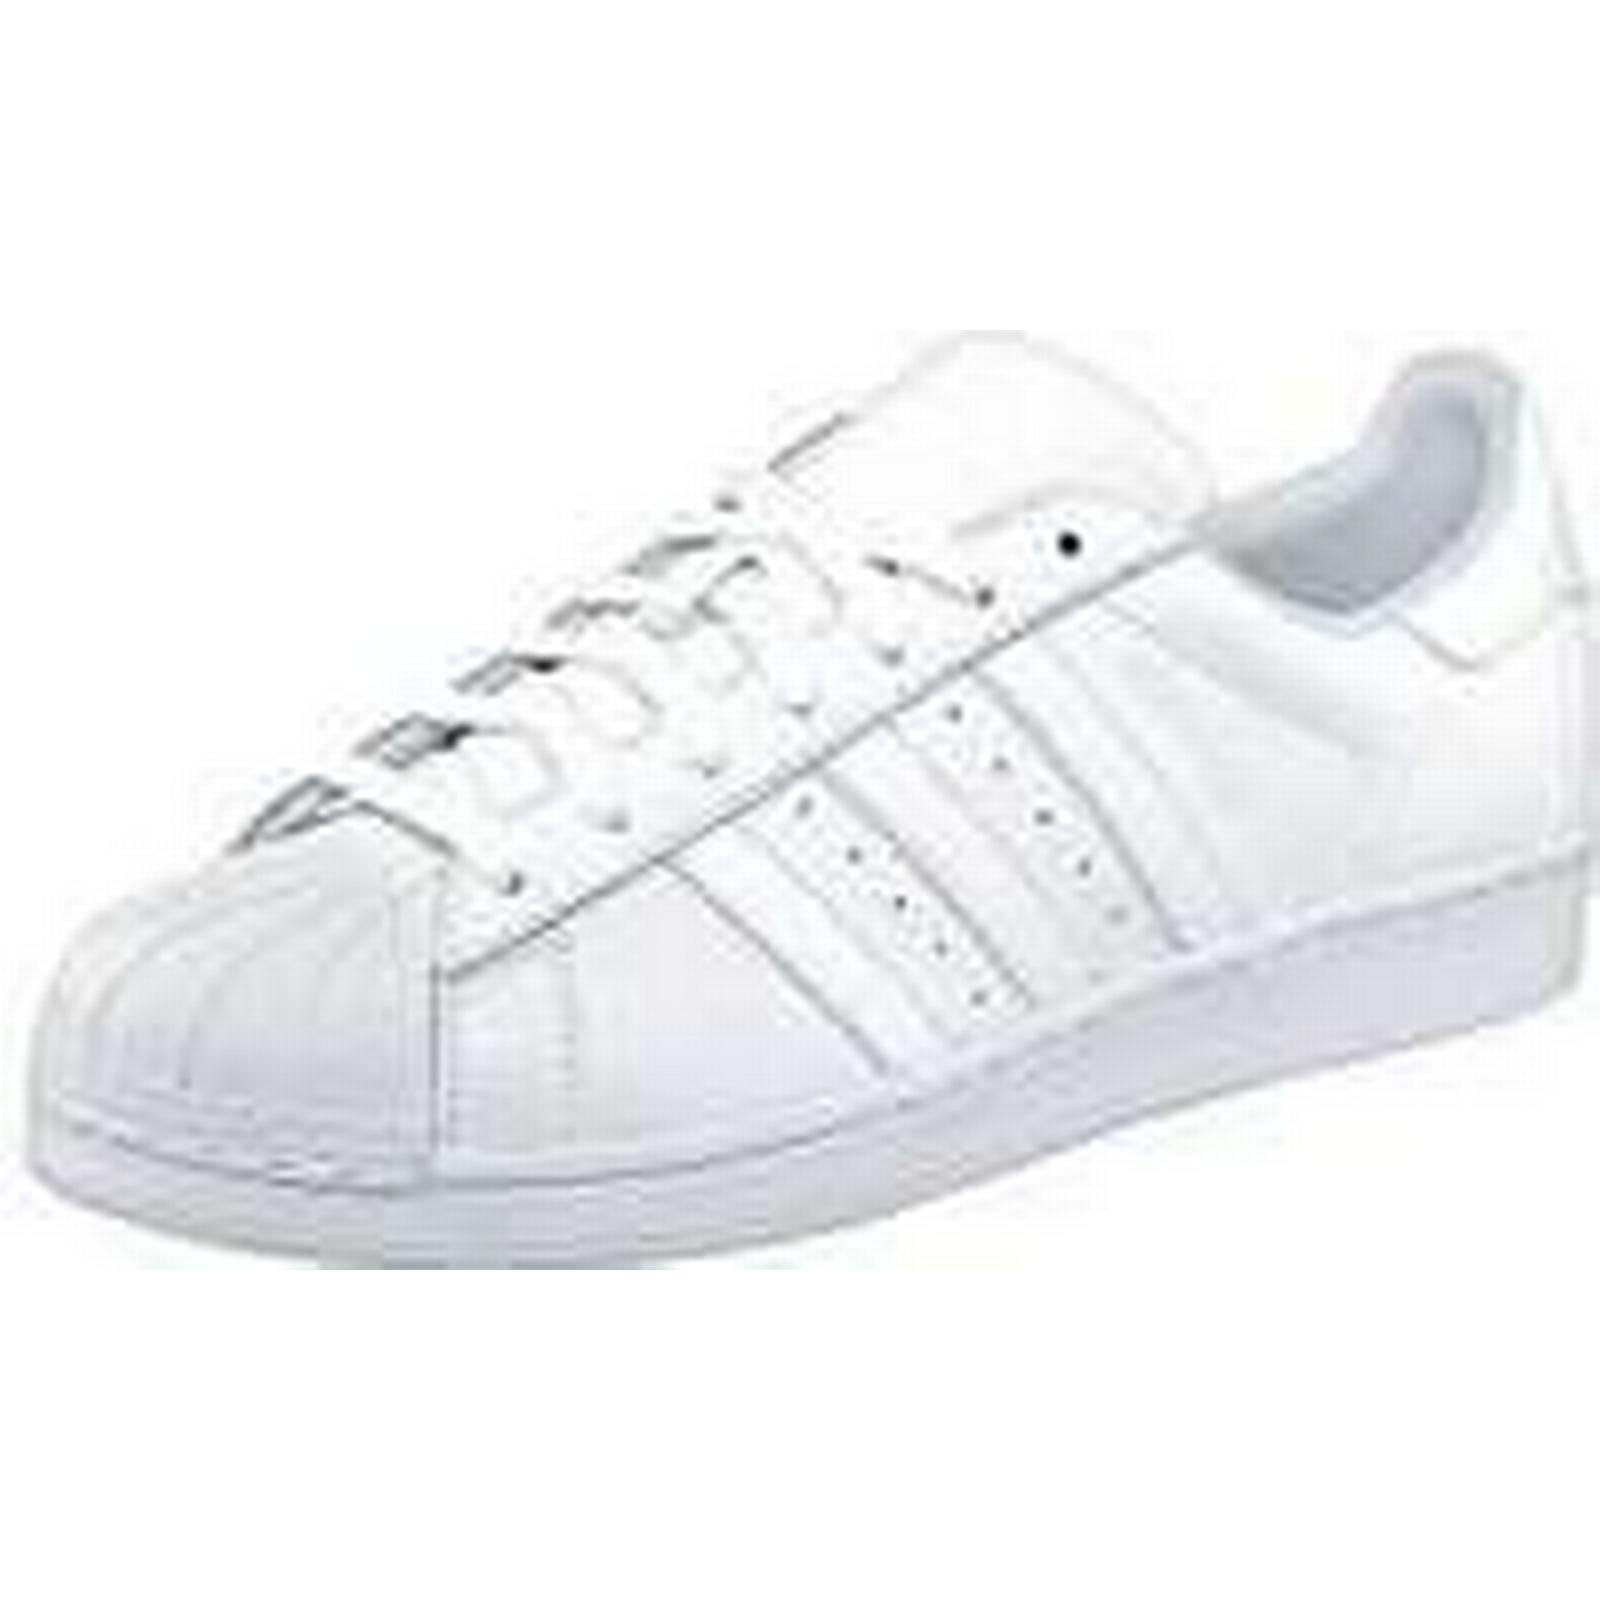 Adidas Originals White Trainers 'Superstar' Trainers White by adidas Originals 305a82